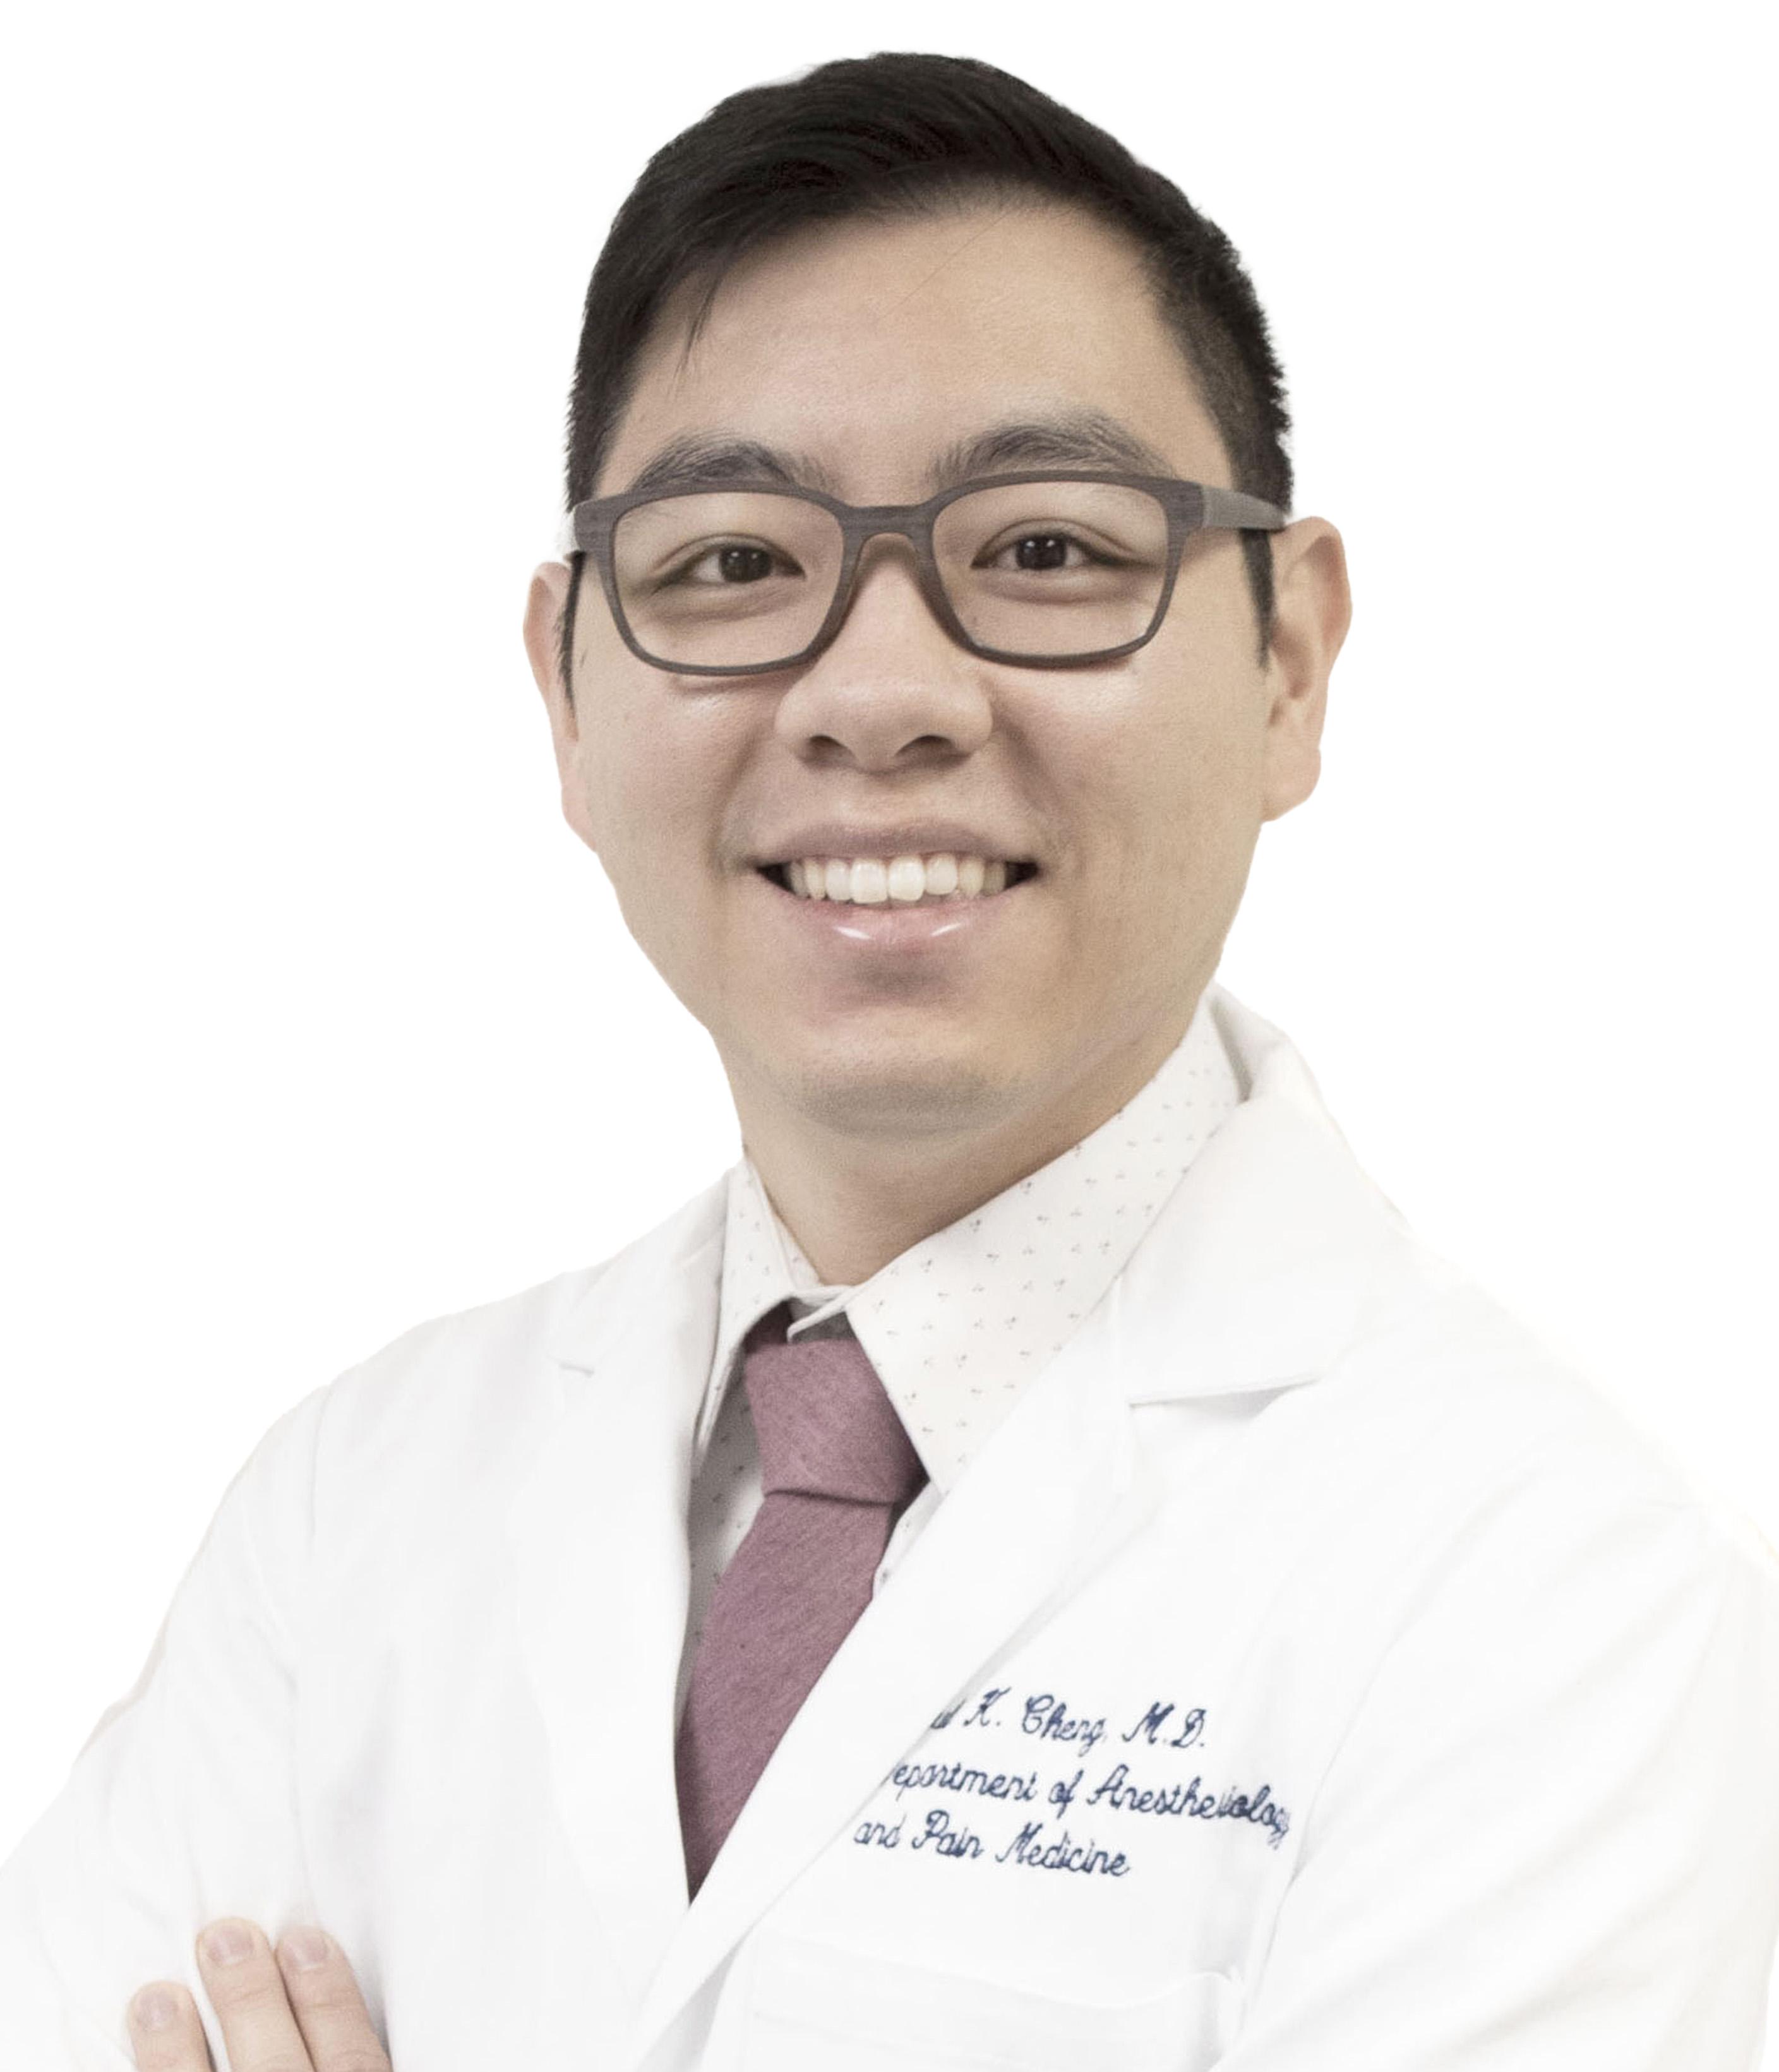 Paul K. Cheng